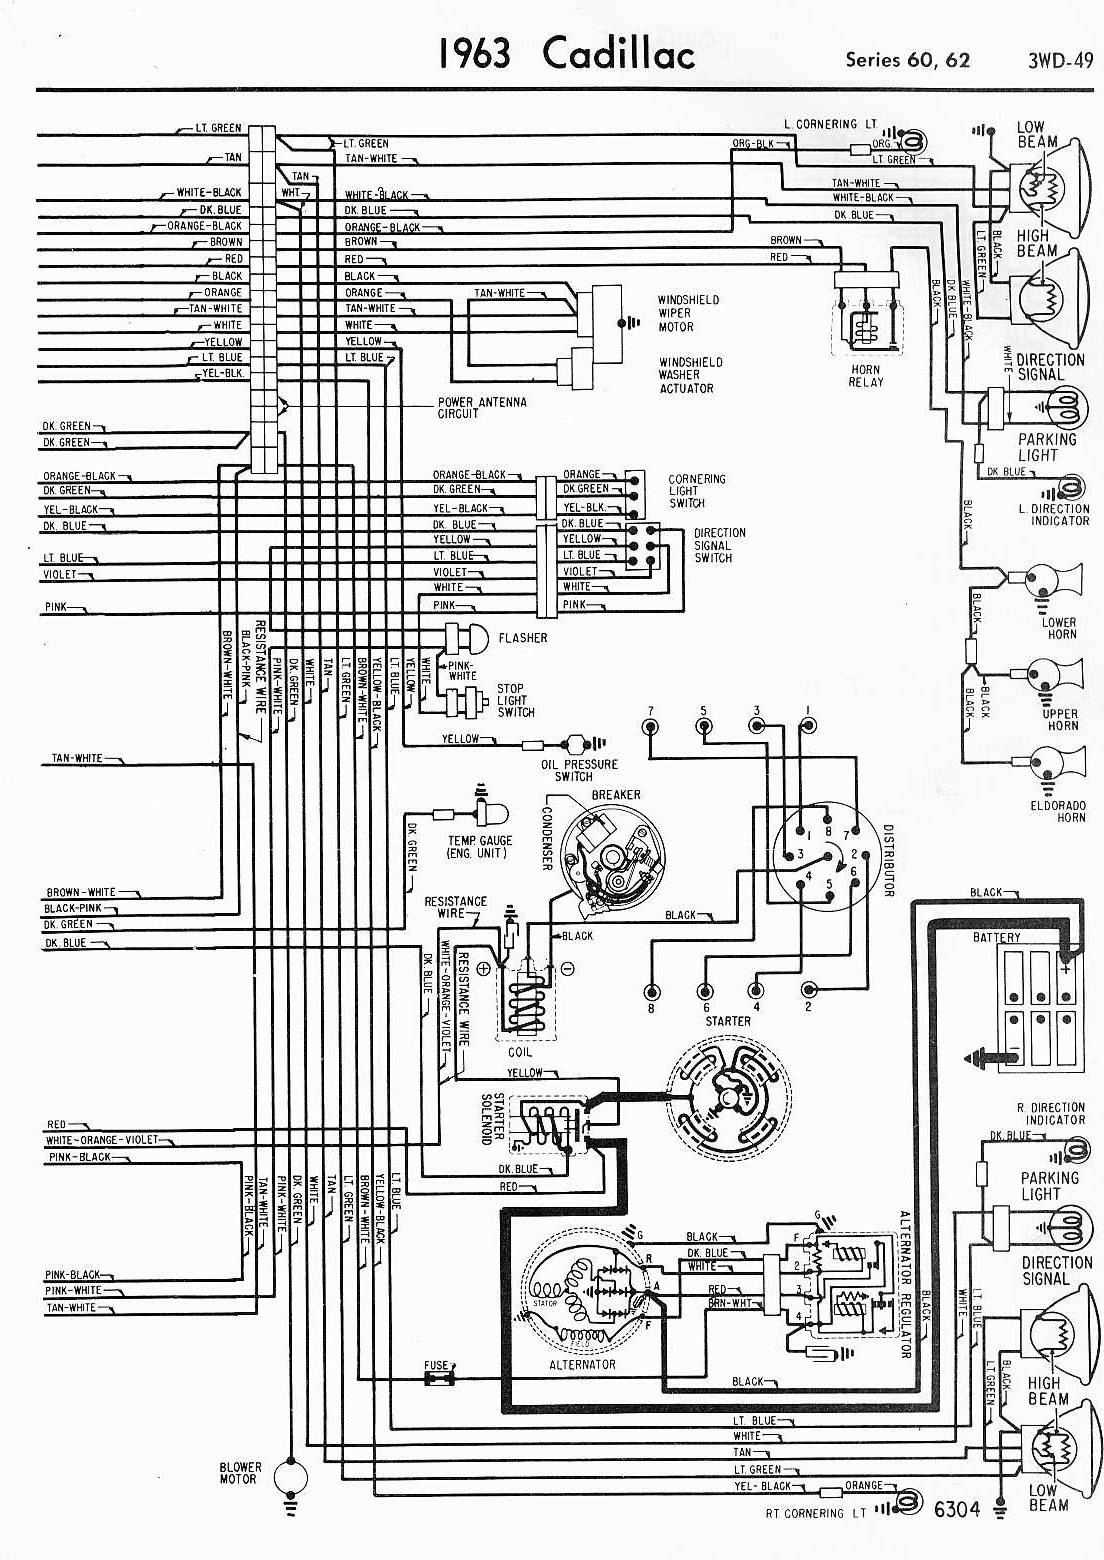 1960 Cadillac Wiring Diagram - Auto Electrical Wiring Diagram • on 2000 cadillac eldorado electrical diagrams, cadillac srx wiring, cadillac schematics,